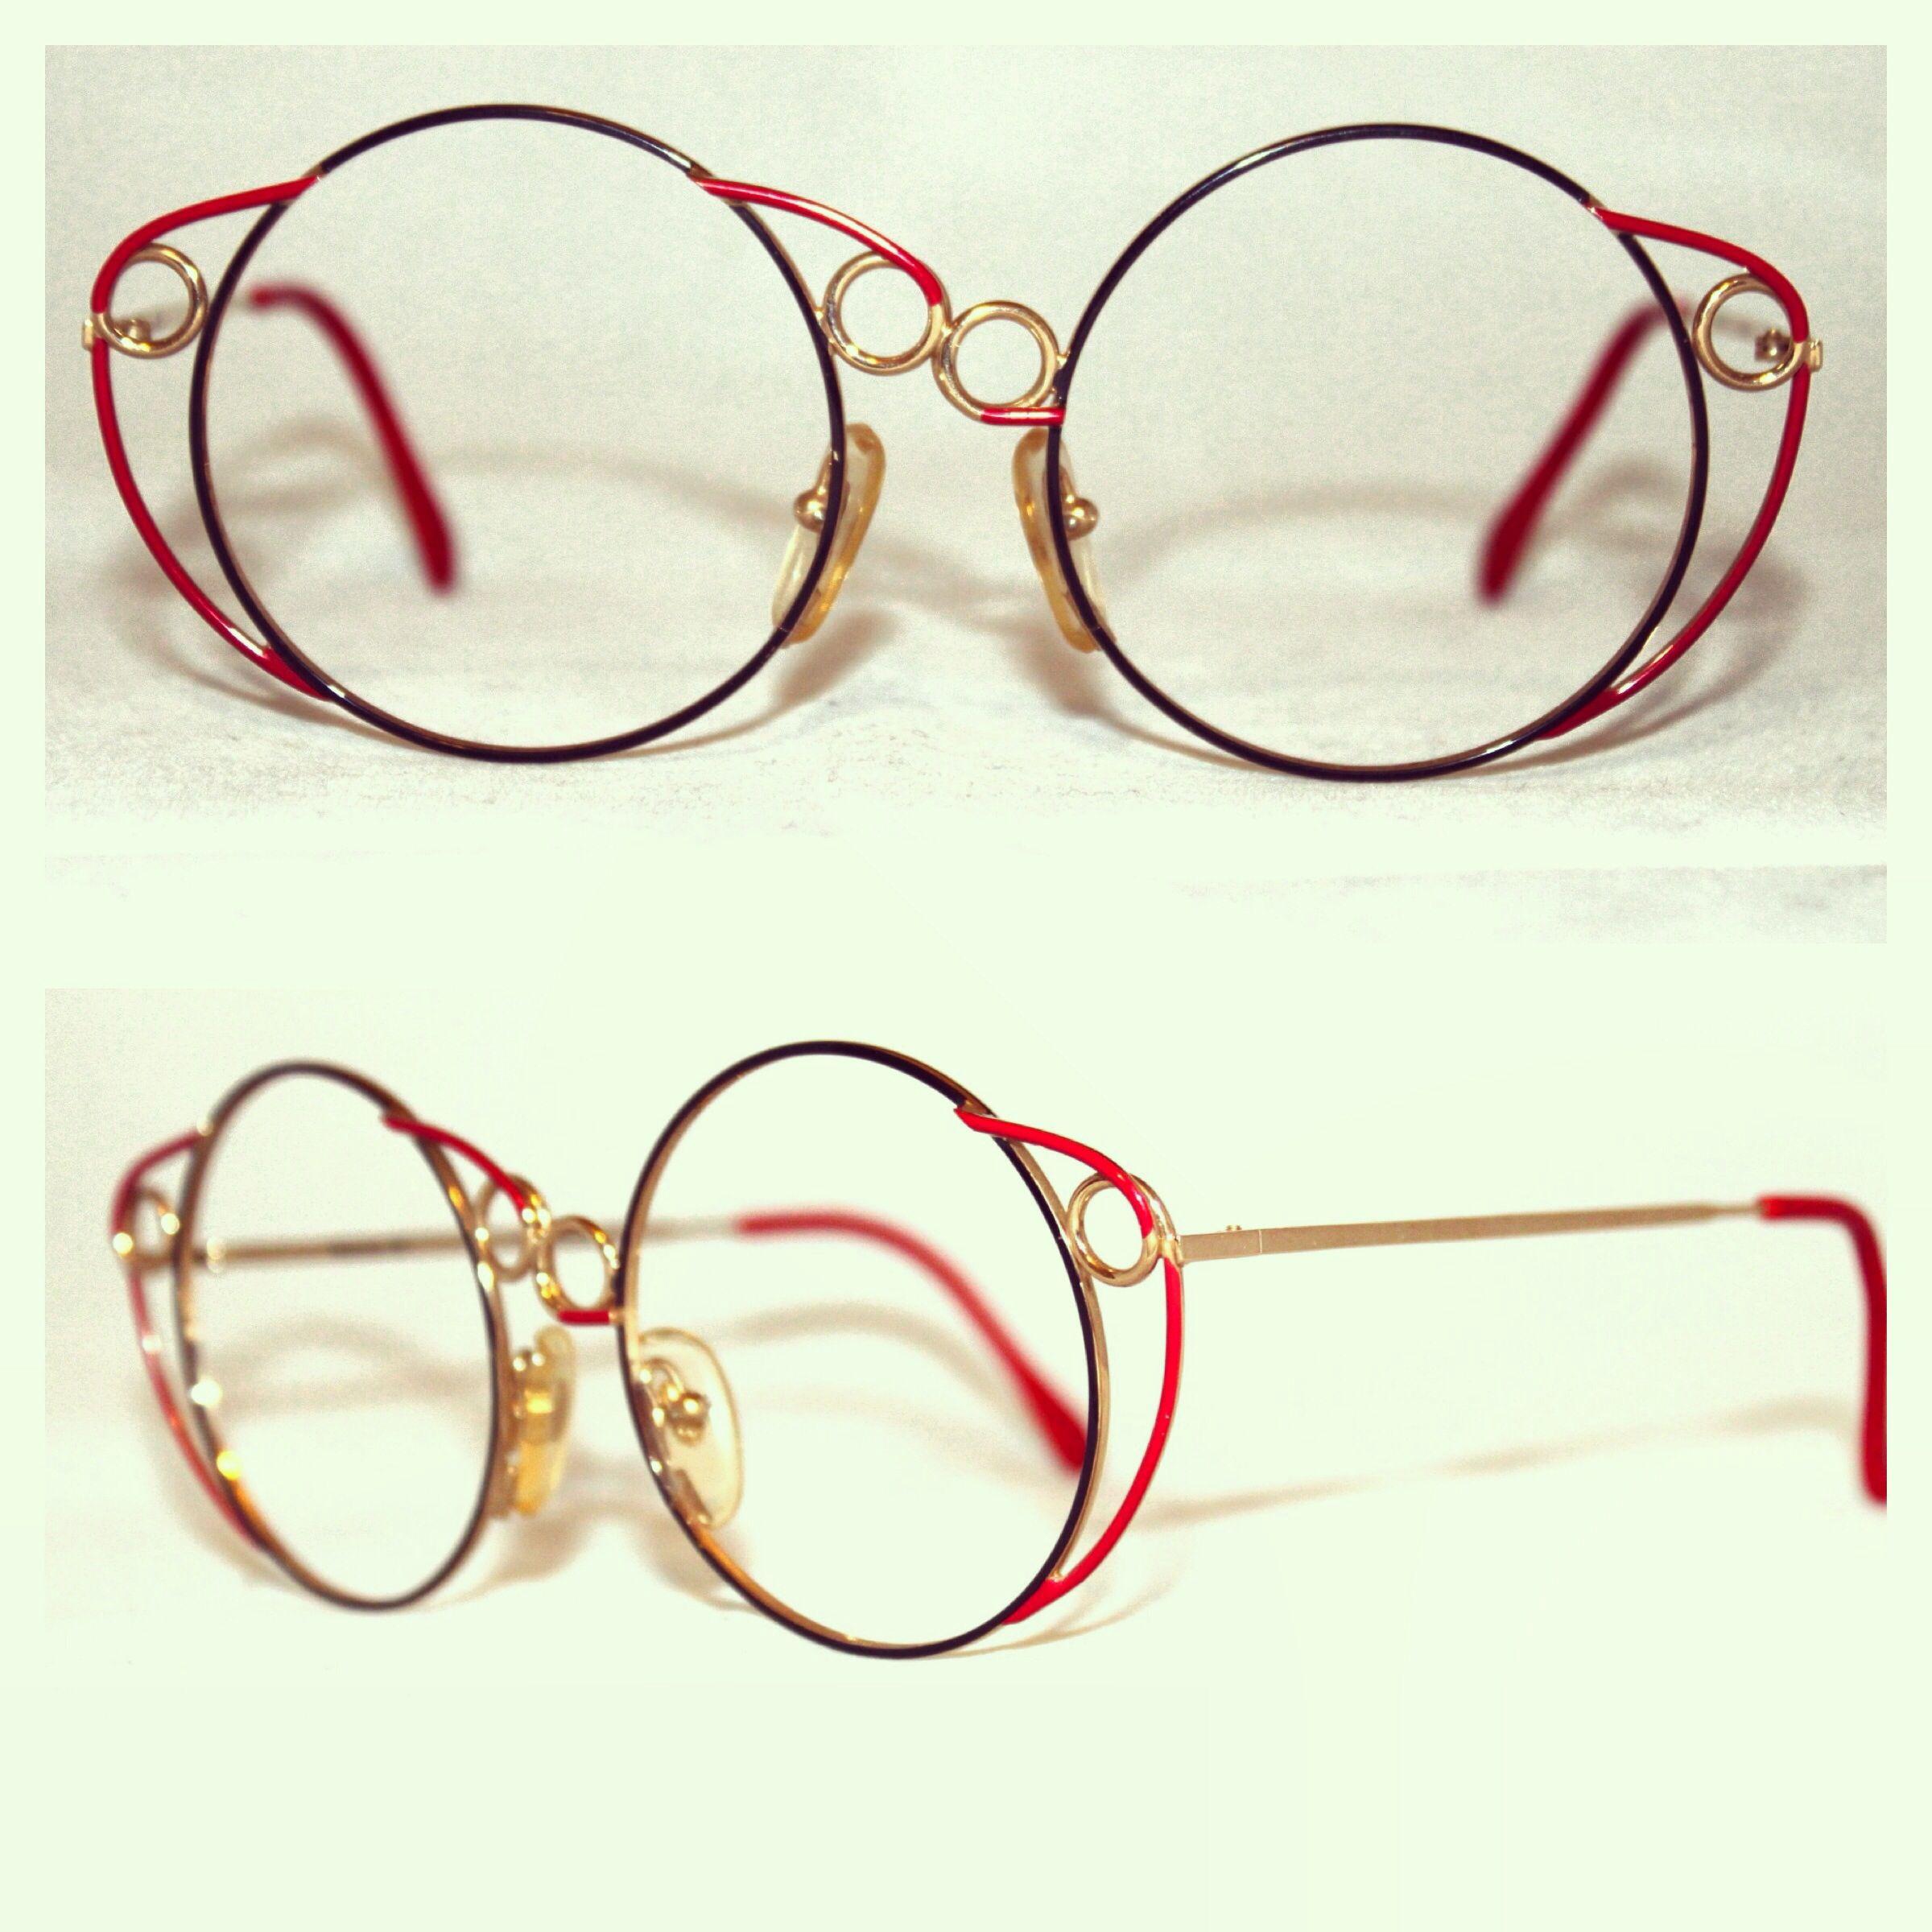 e40af9e575 Vintage Casanova 24K Gold Plated Handpainted Sunglasses Eyeglasses Handmade  in France